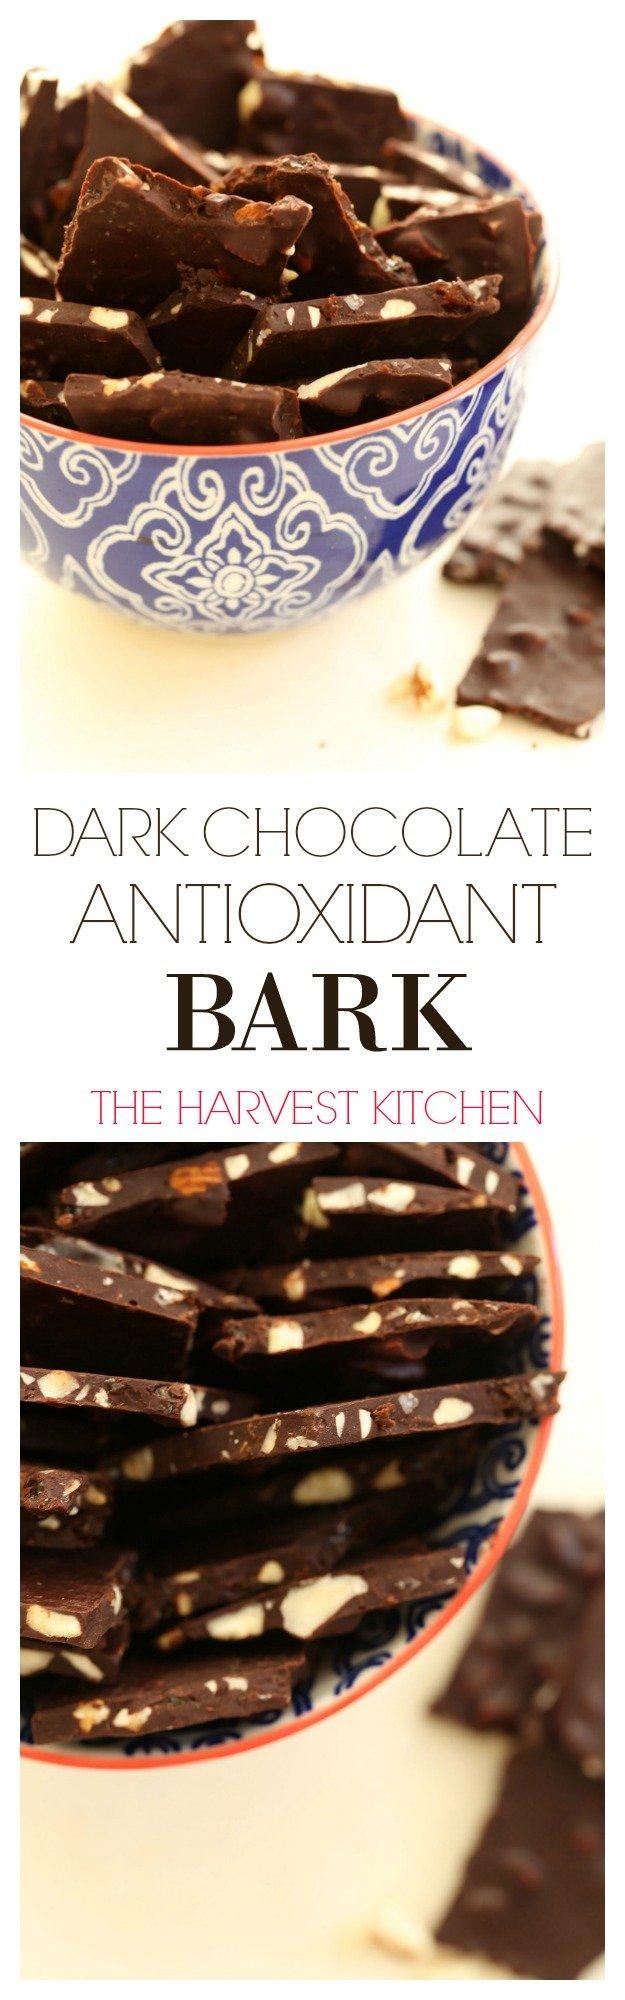 dark-chocolate-antioxidant-bark